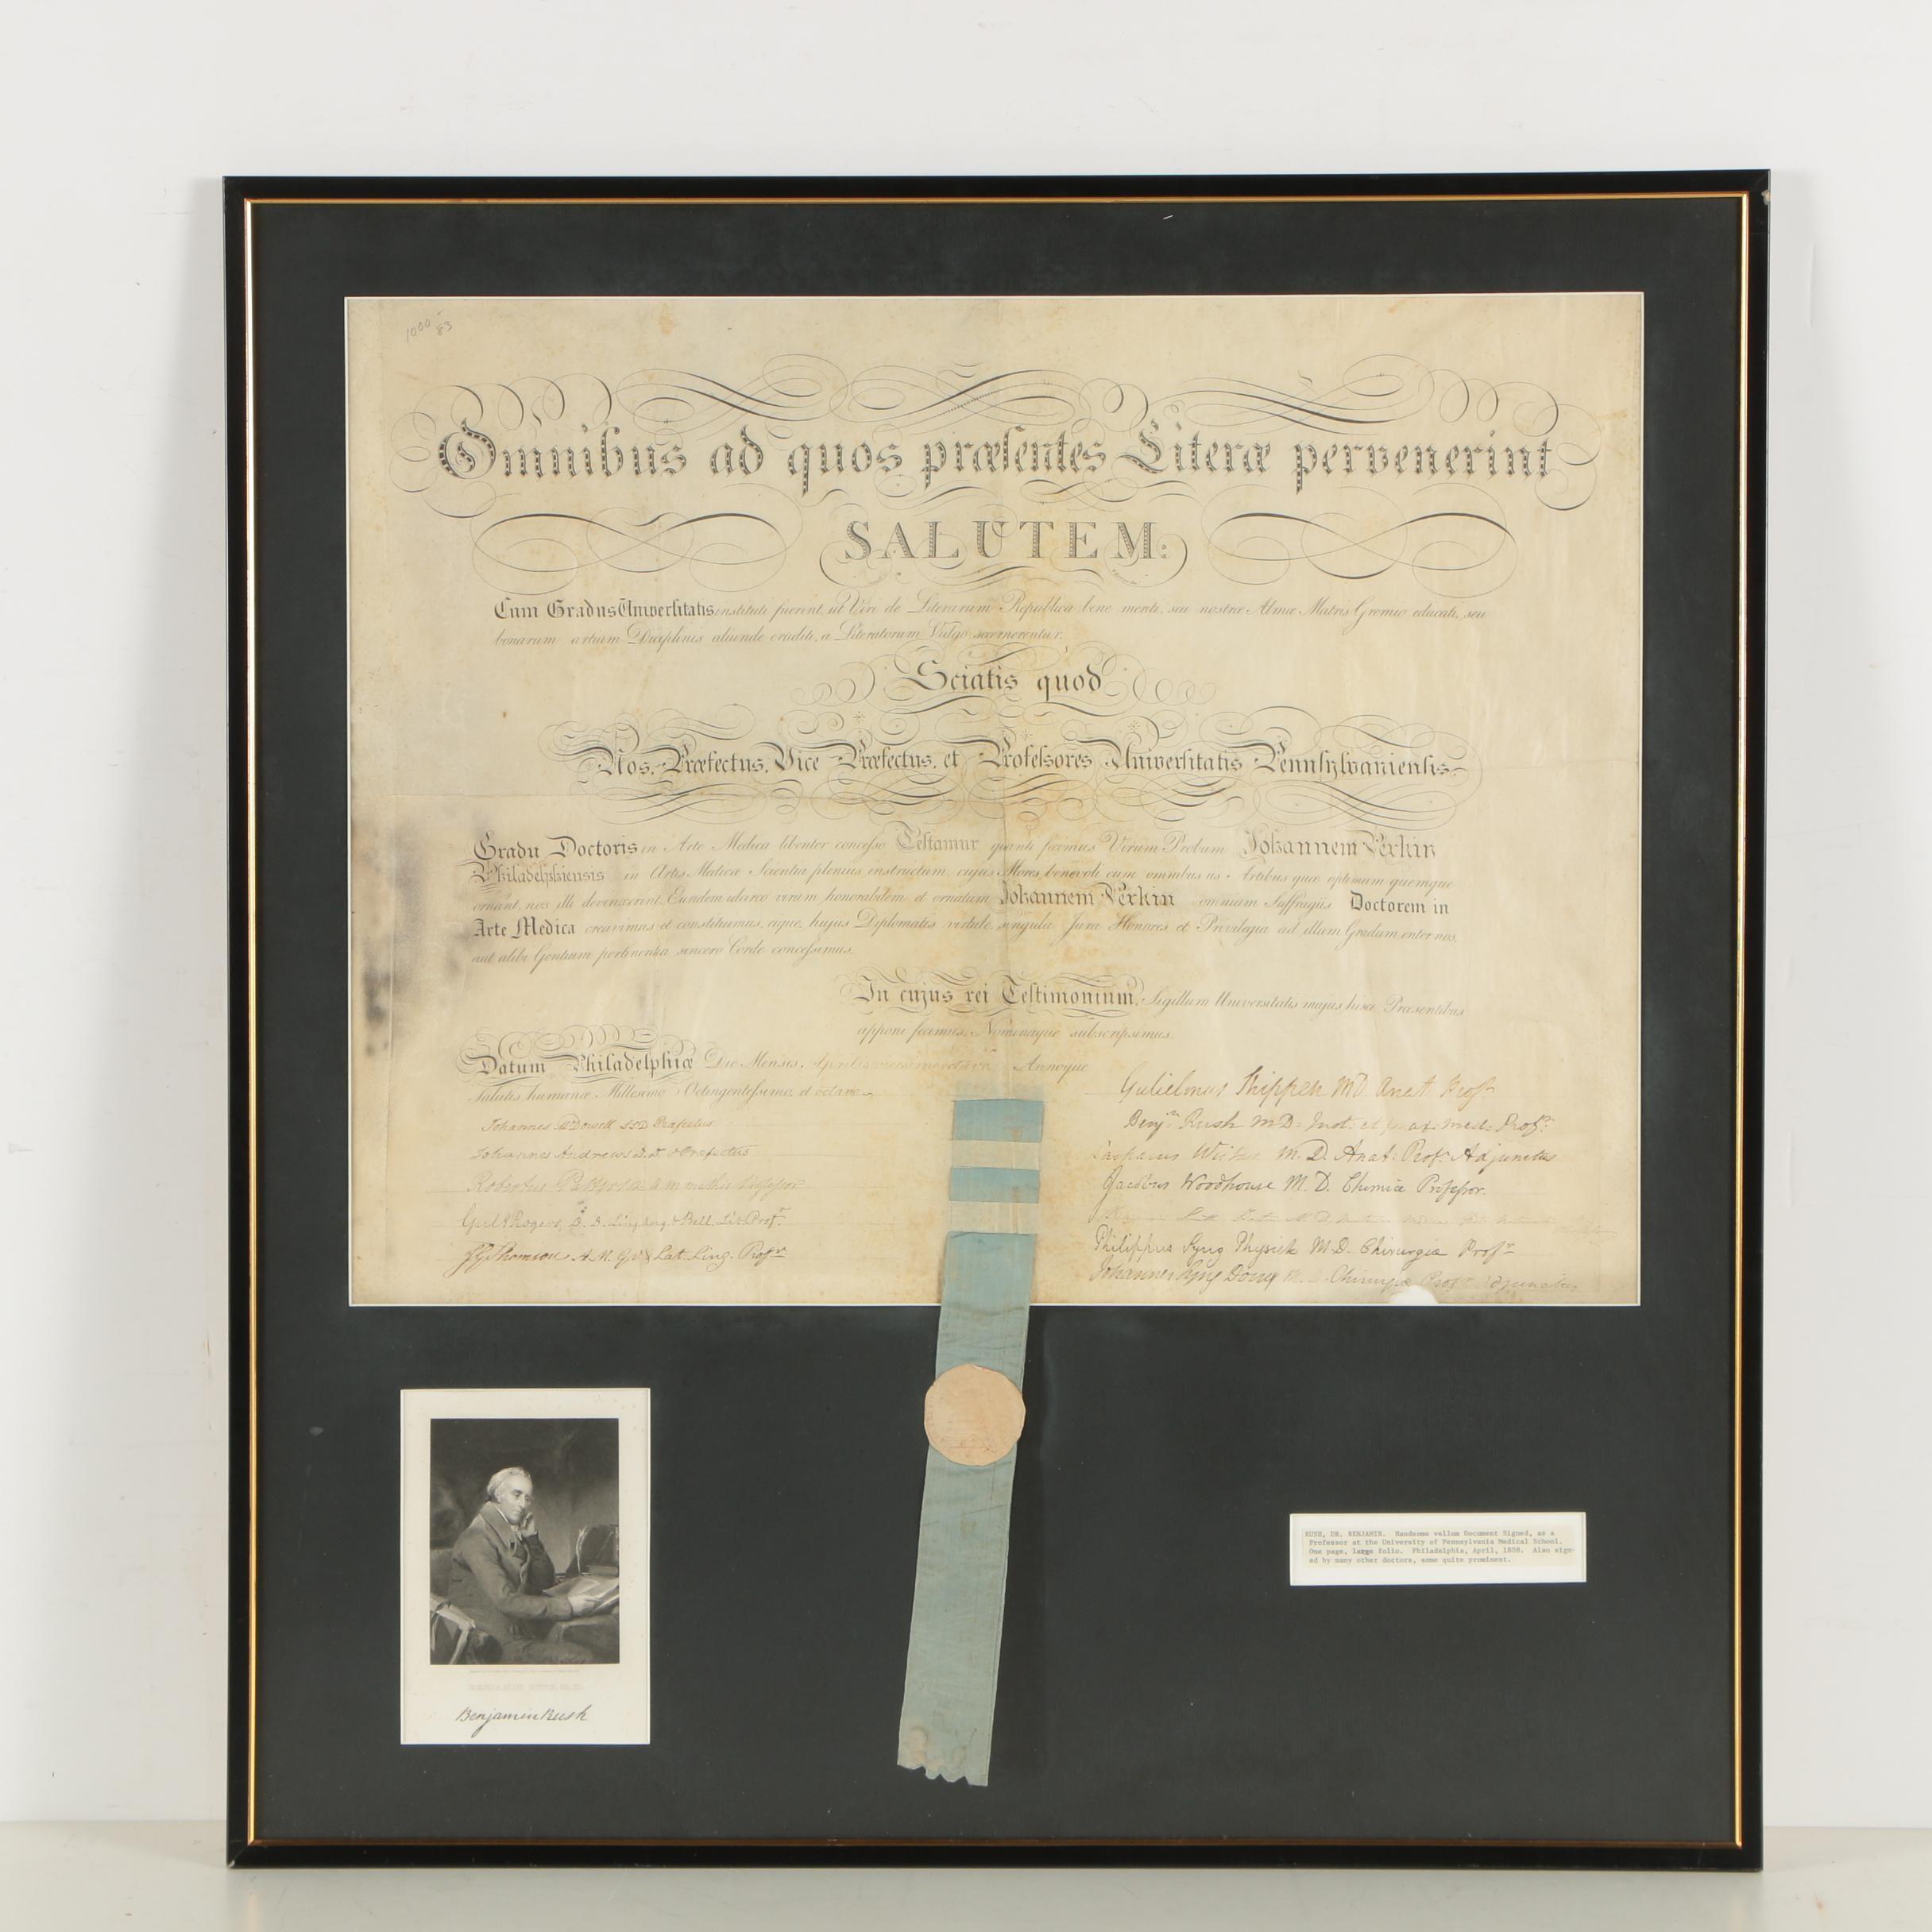 Benjamin Rush Signed University of Pennsylvania Medical Diploma